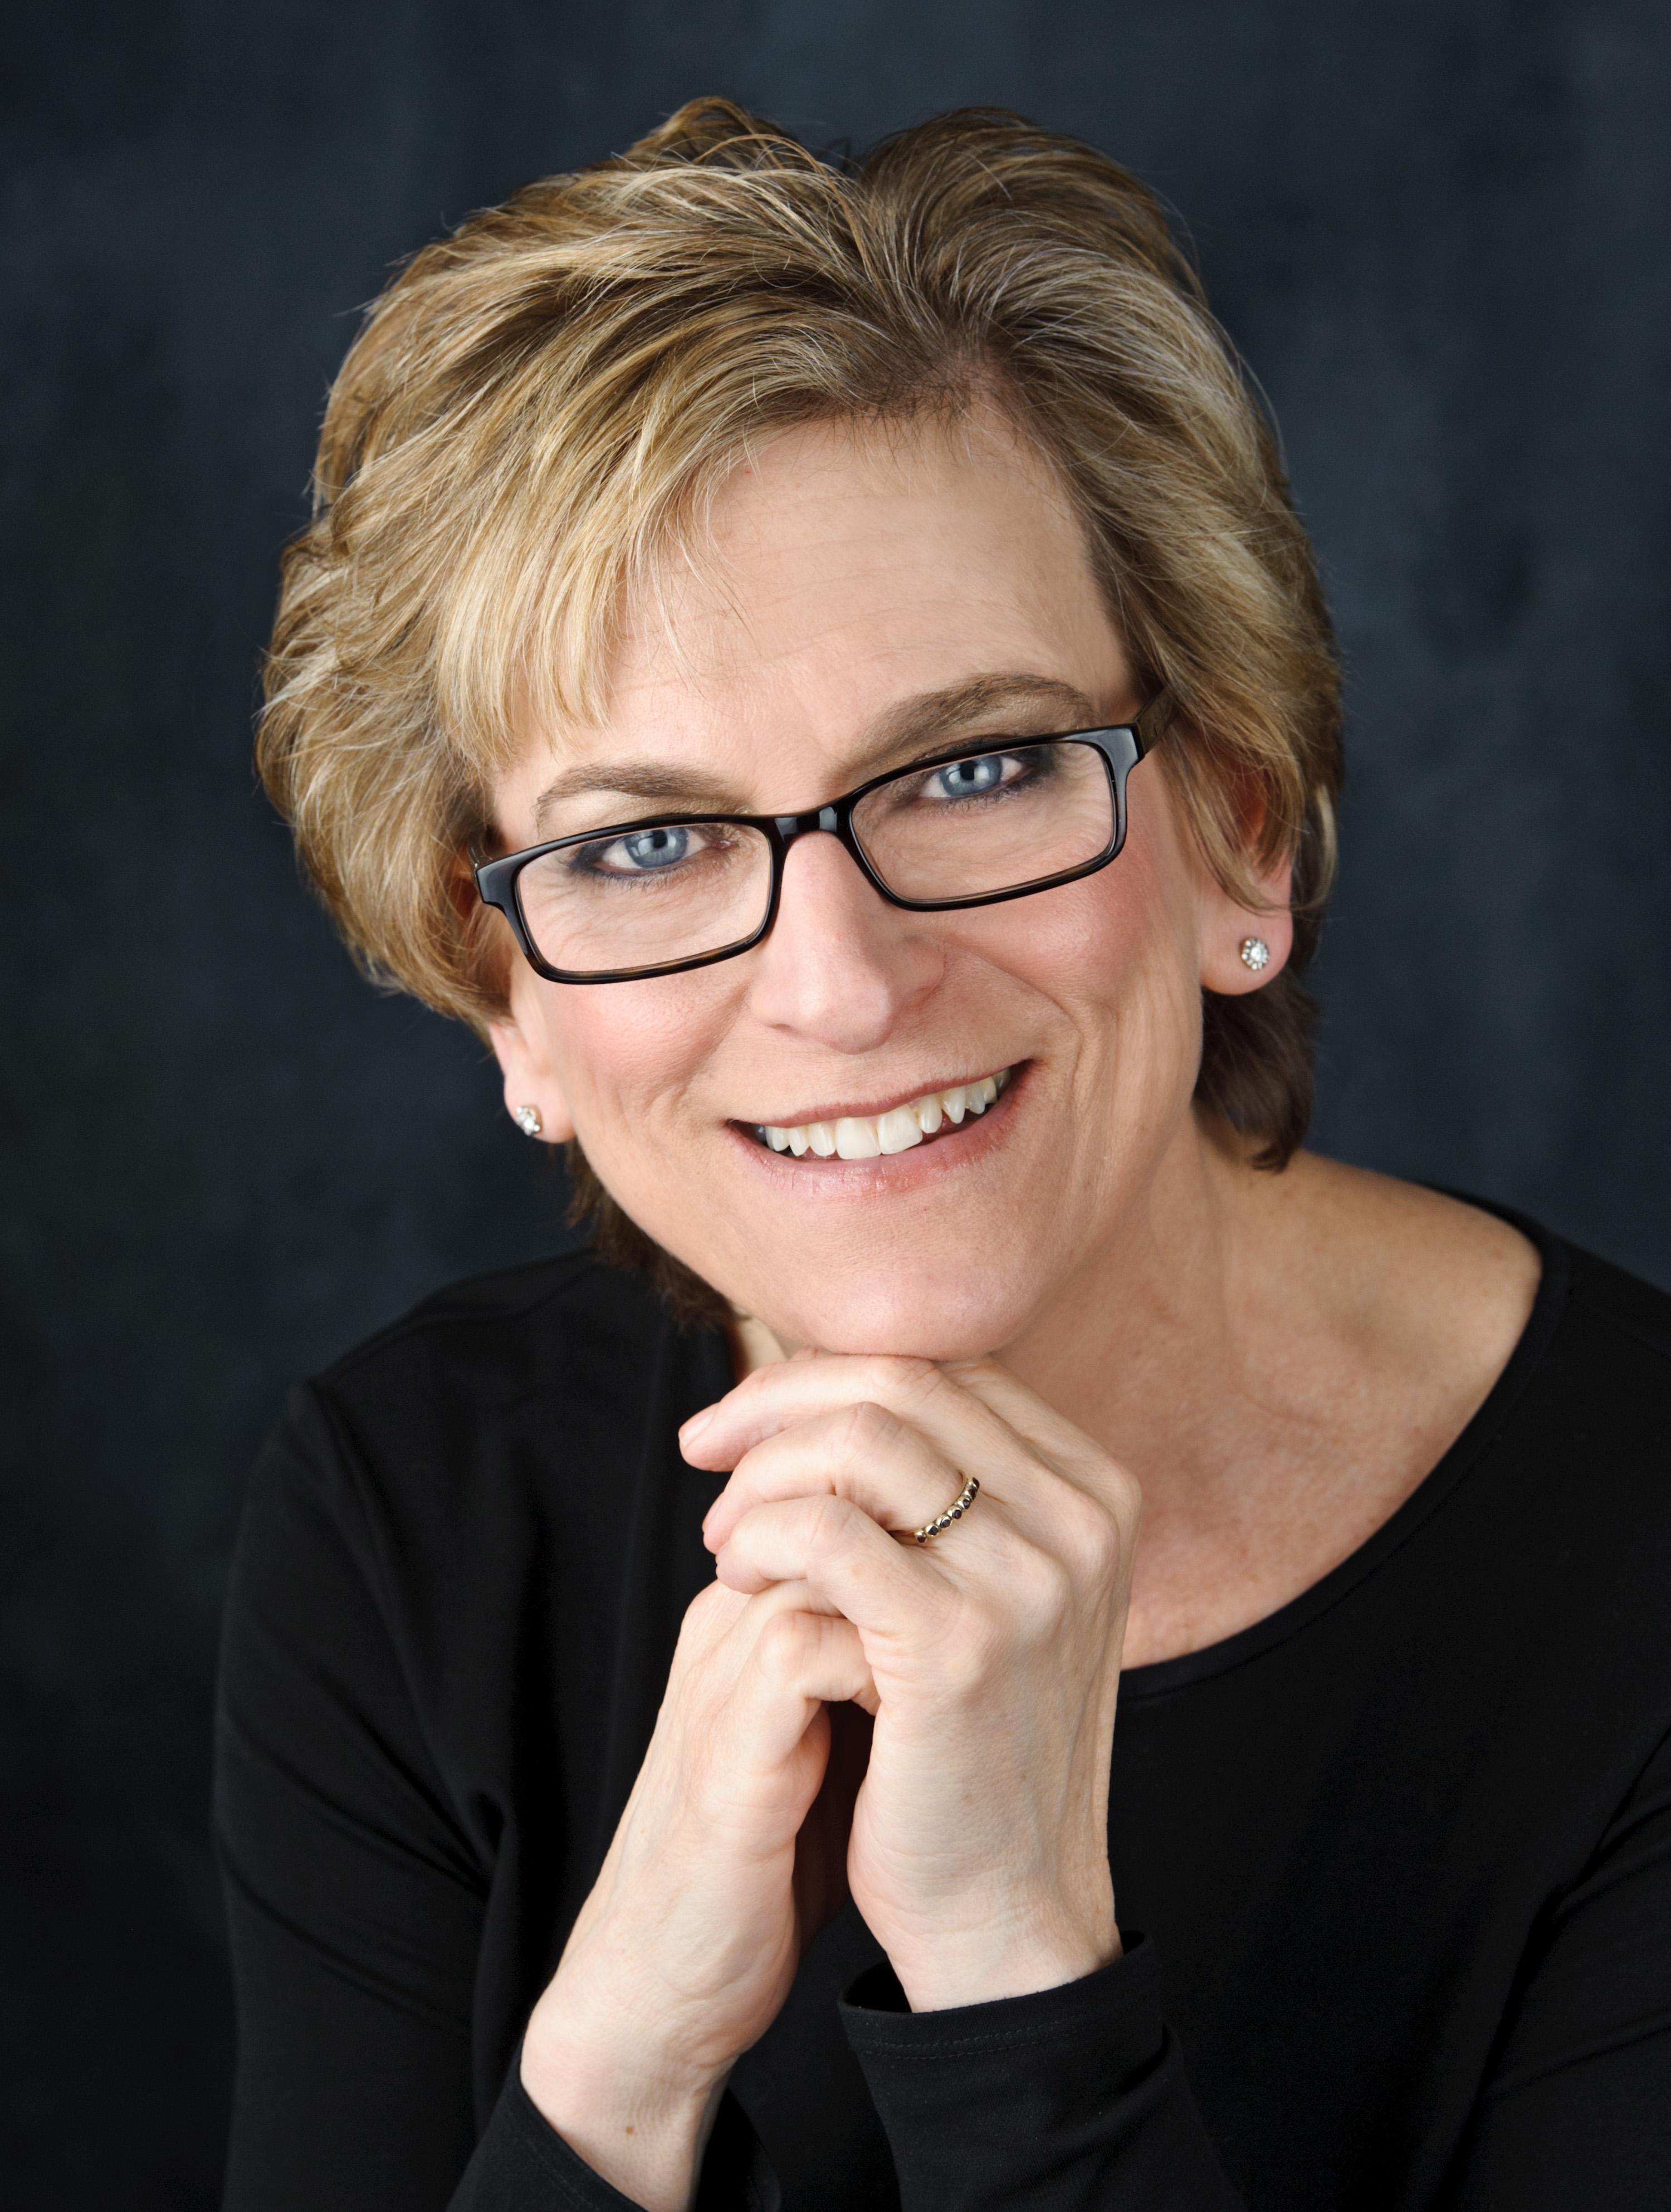 Anita Diamant (Photo: Gretje Fergeson)